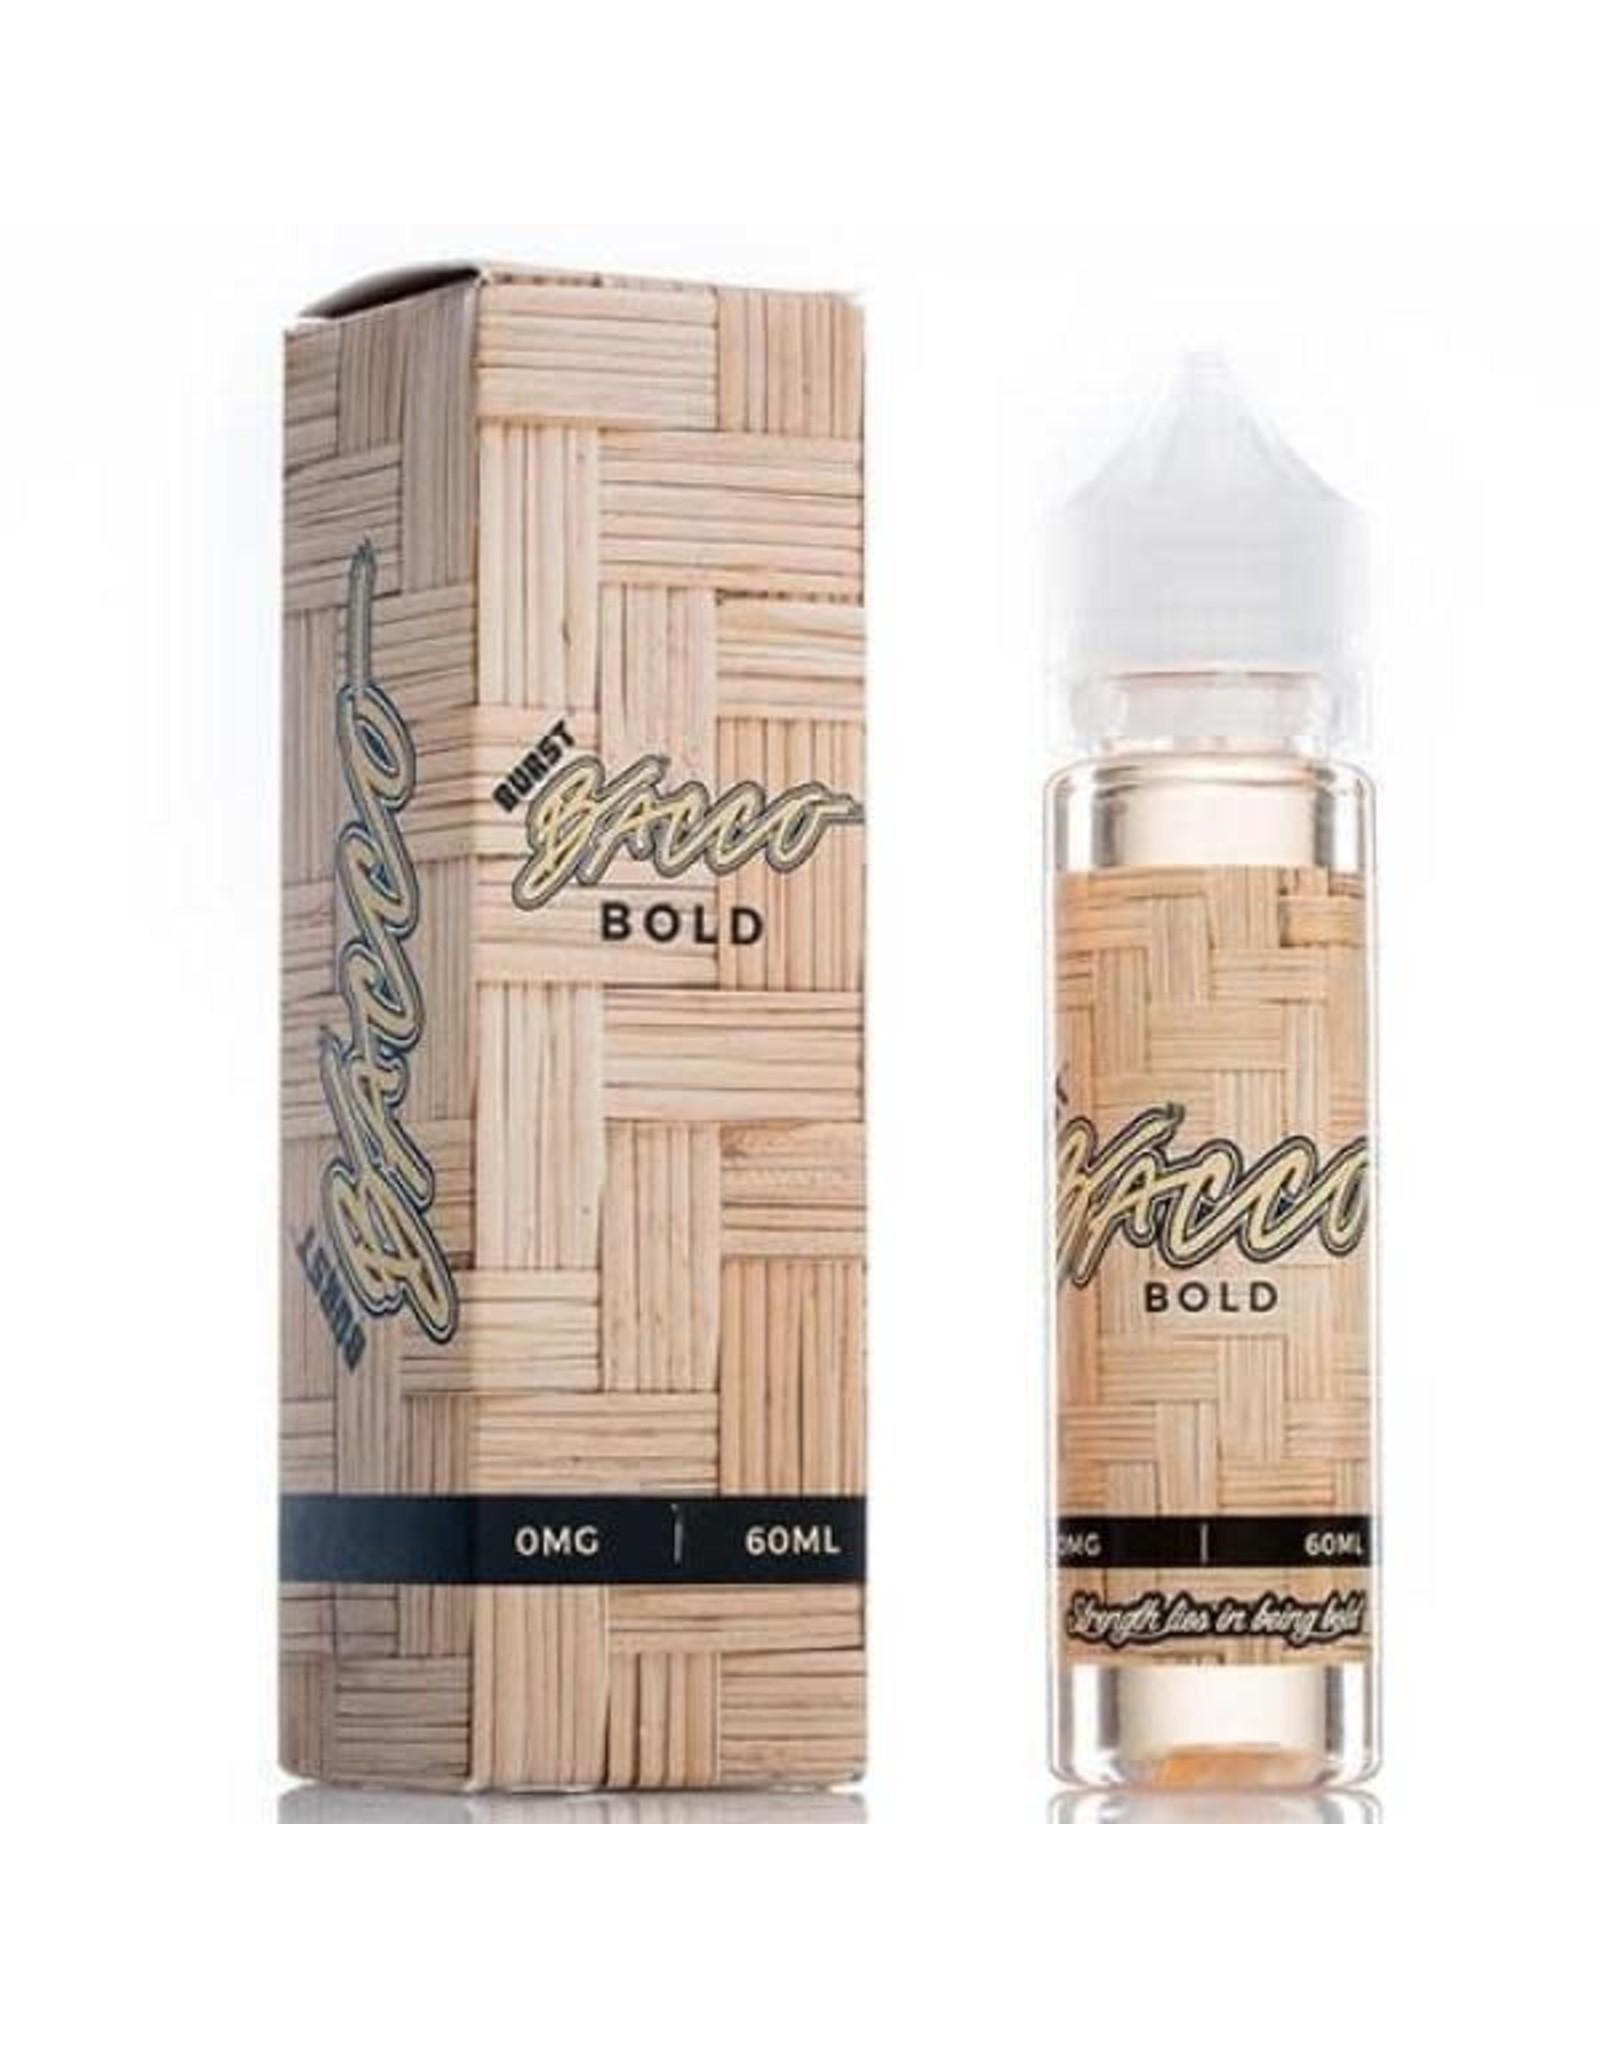 Burst E-liquid Bacco Bold 60 ML 3 MG